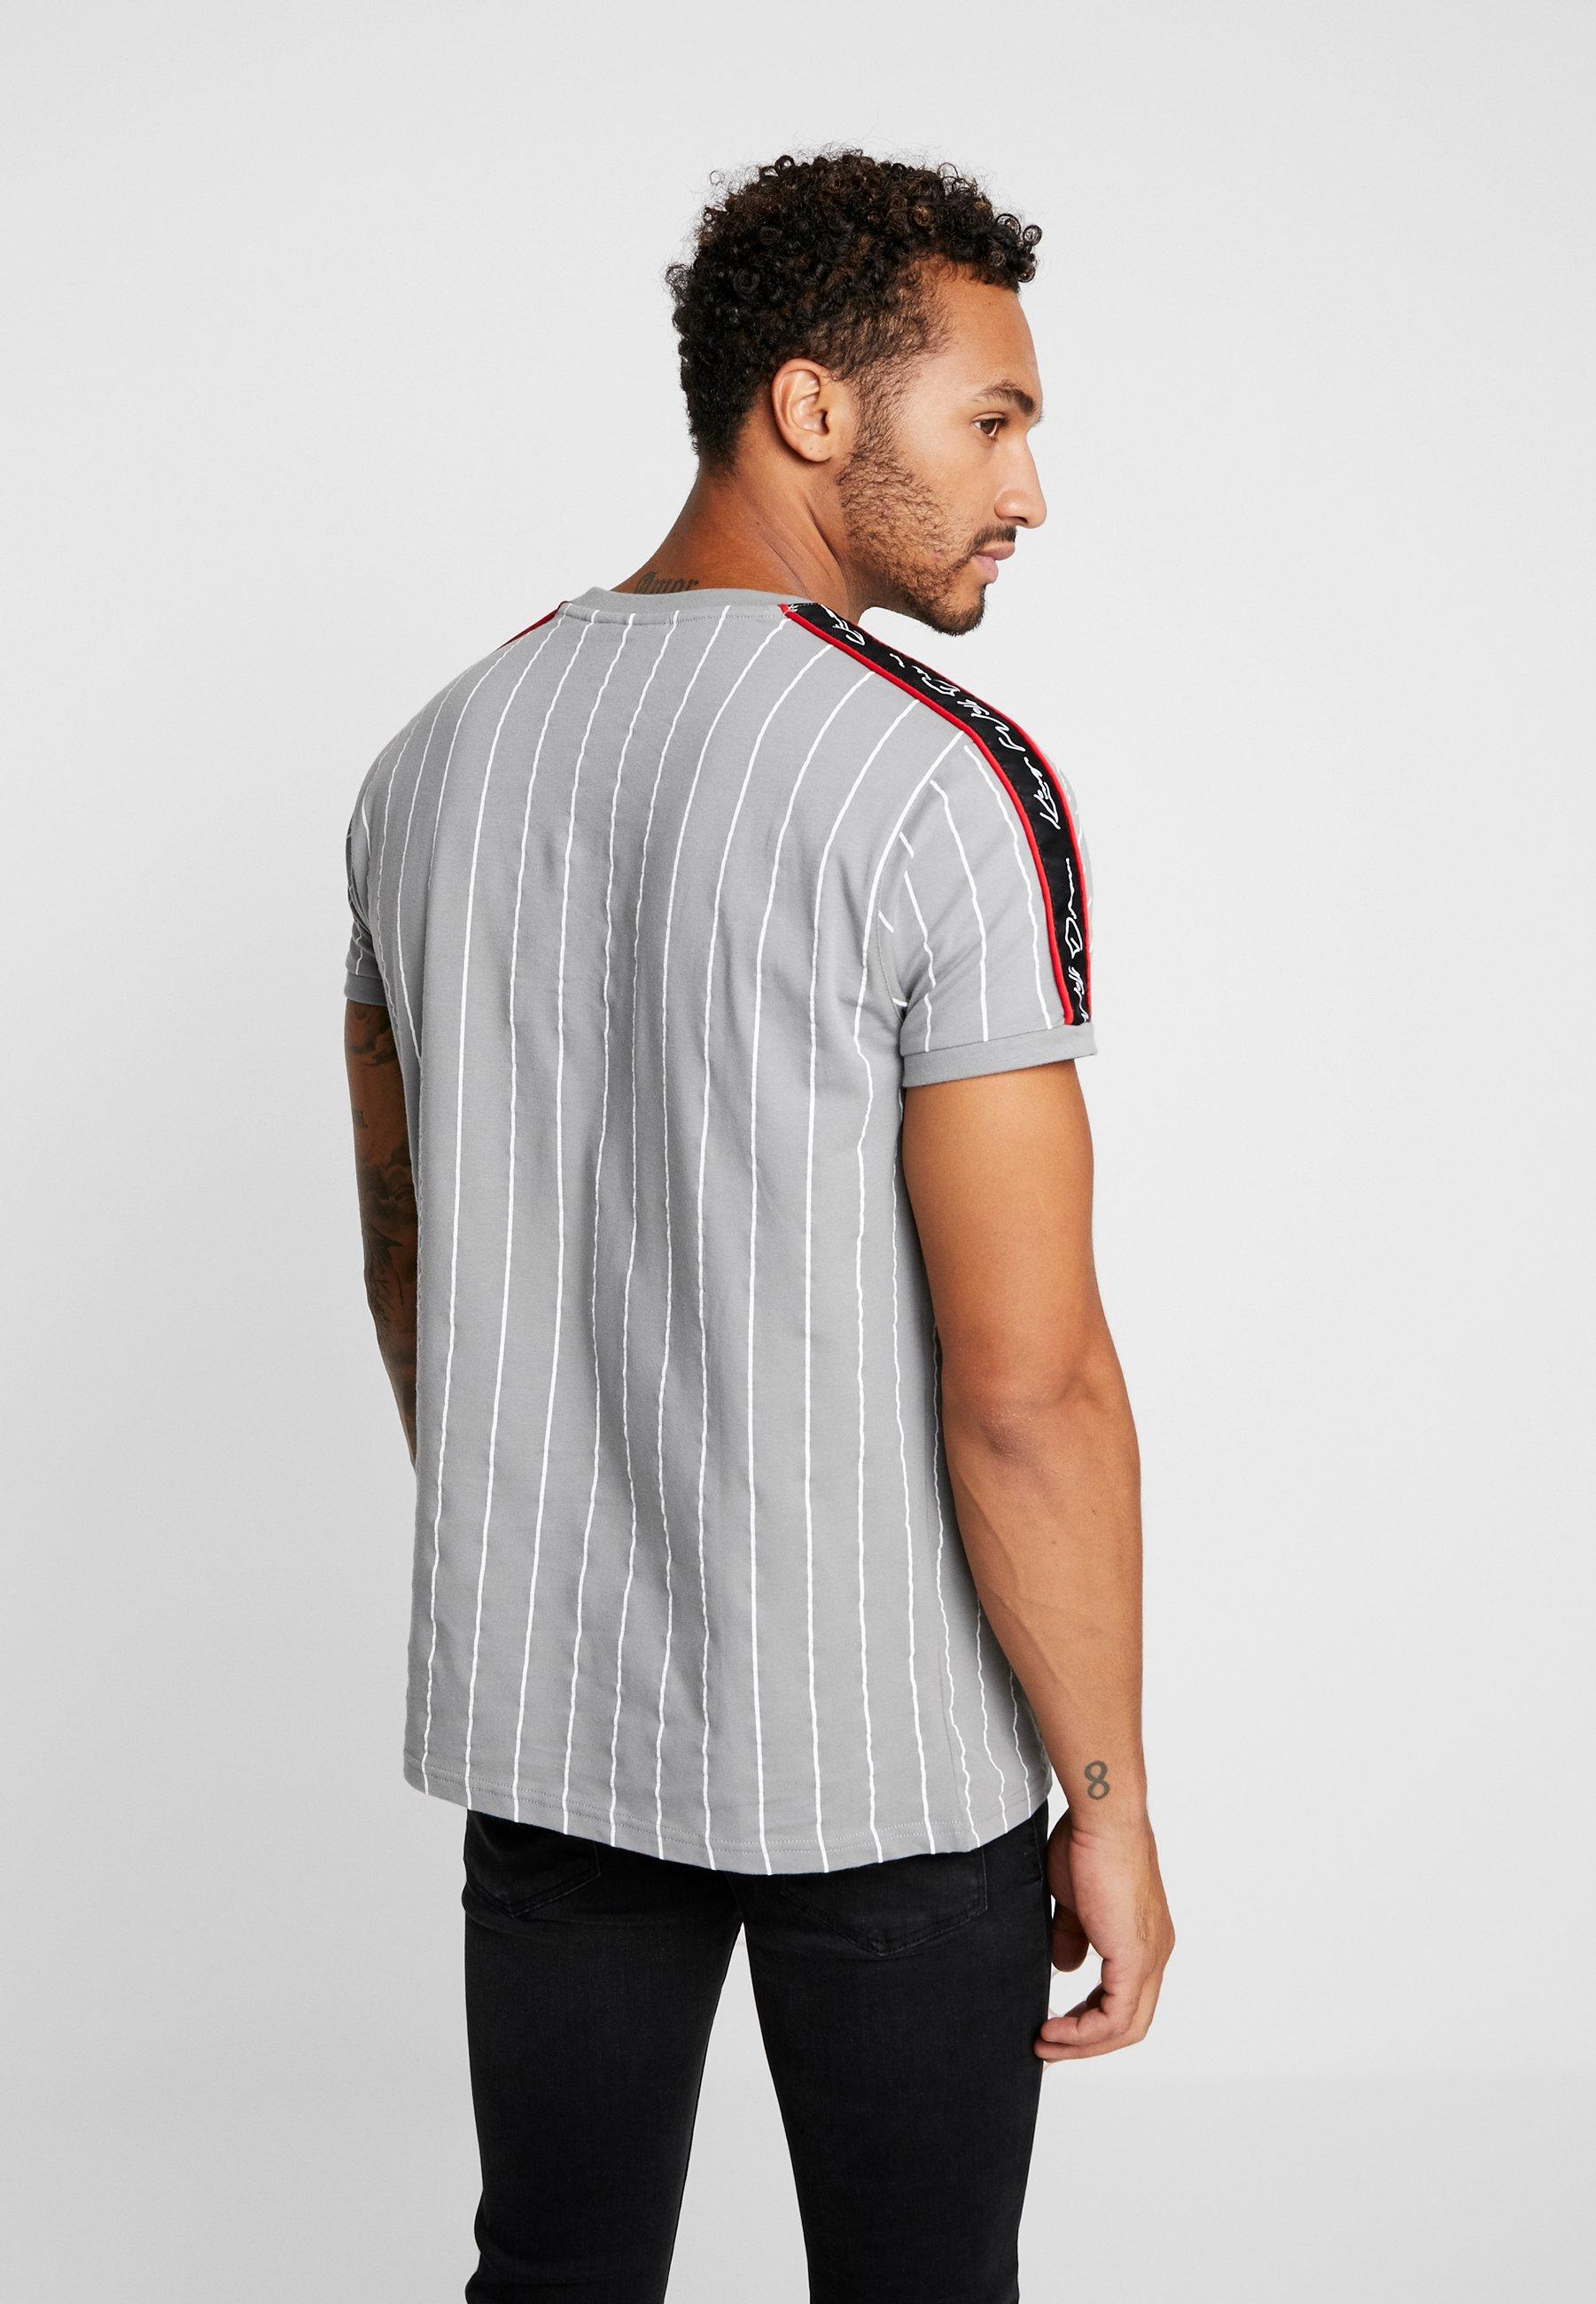 RiftonT shirt Dream Imprimé Grey Will Kings 7yvgYbf6